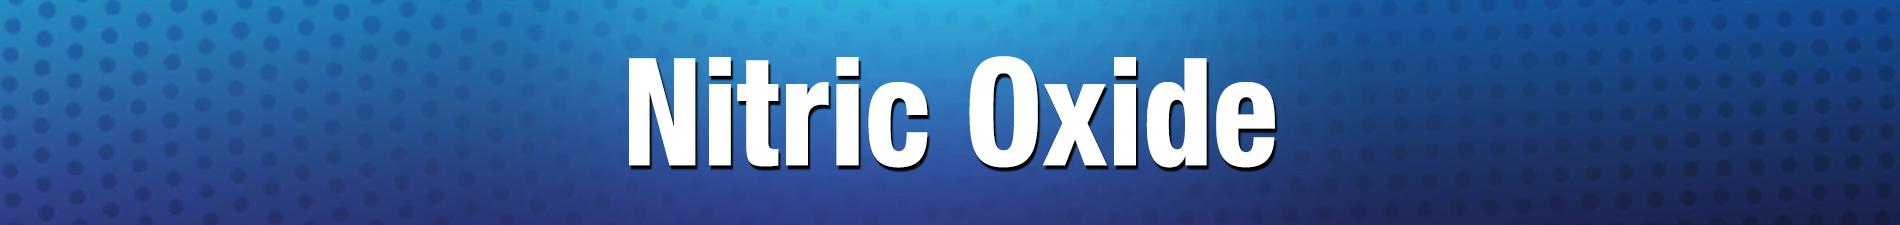 nitric-oxide.jpg